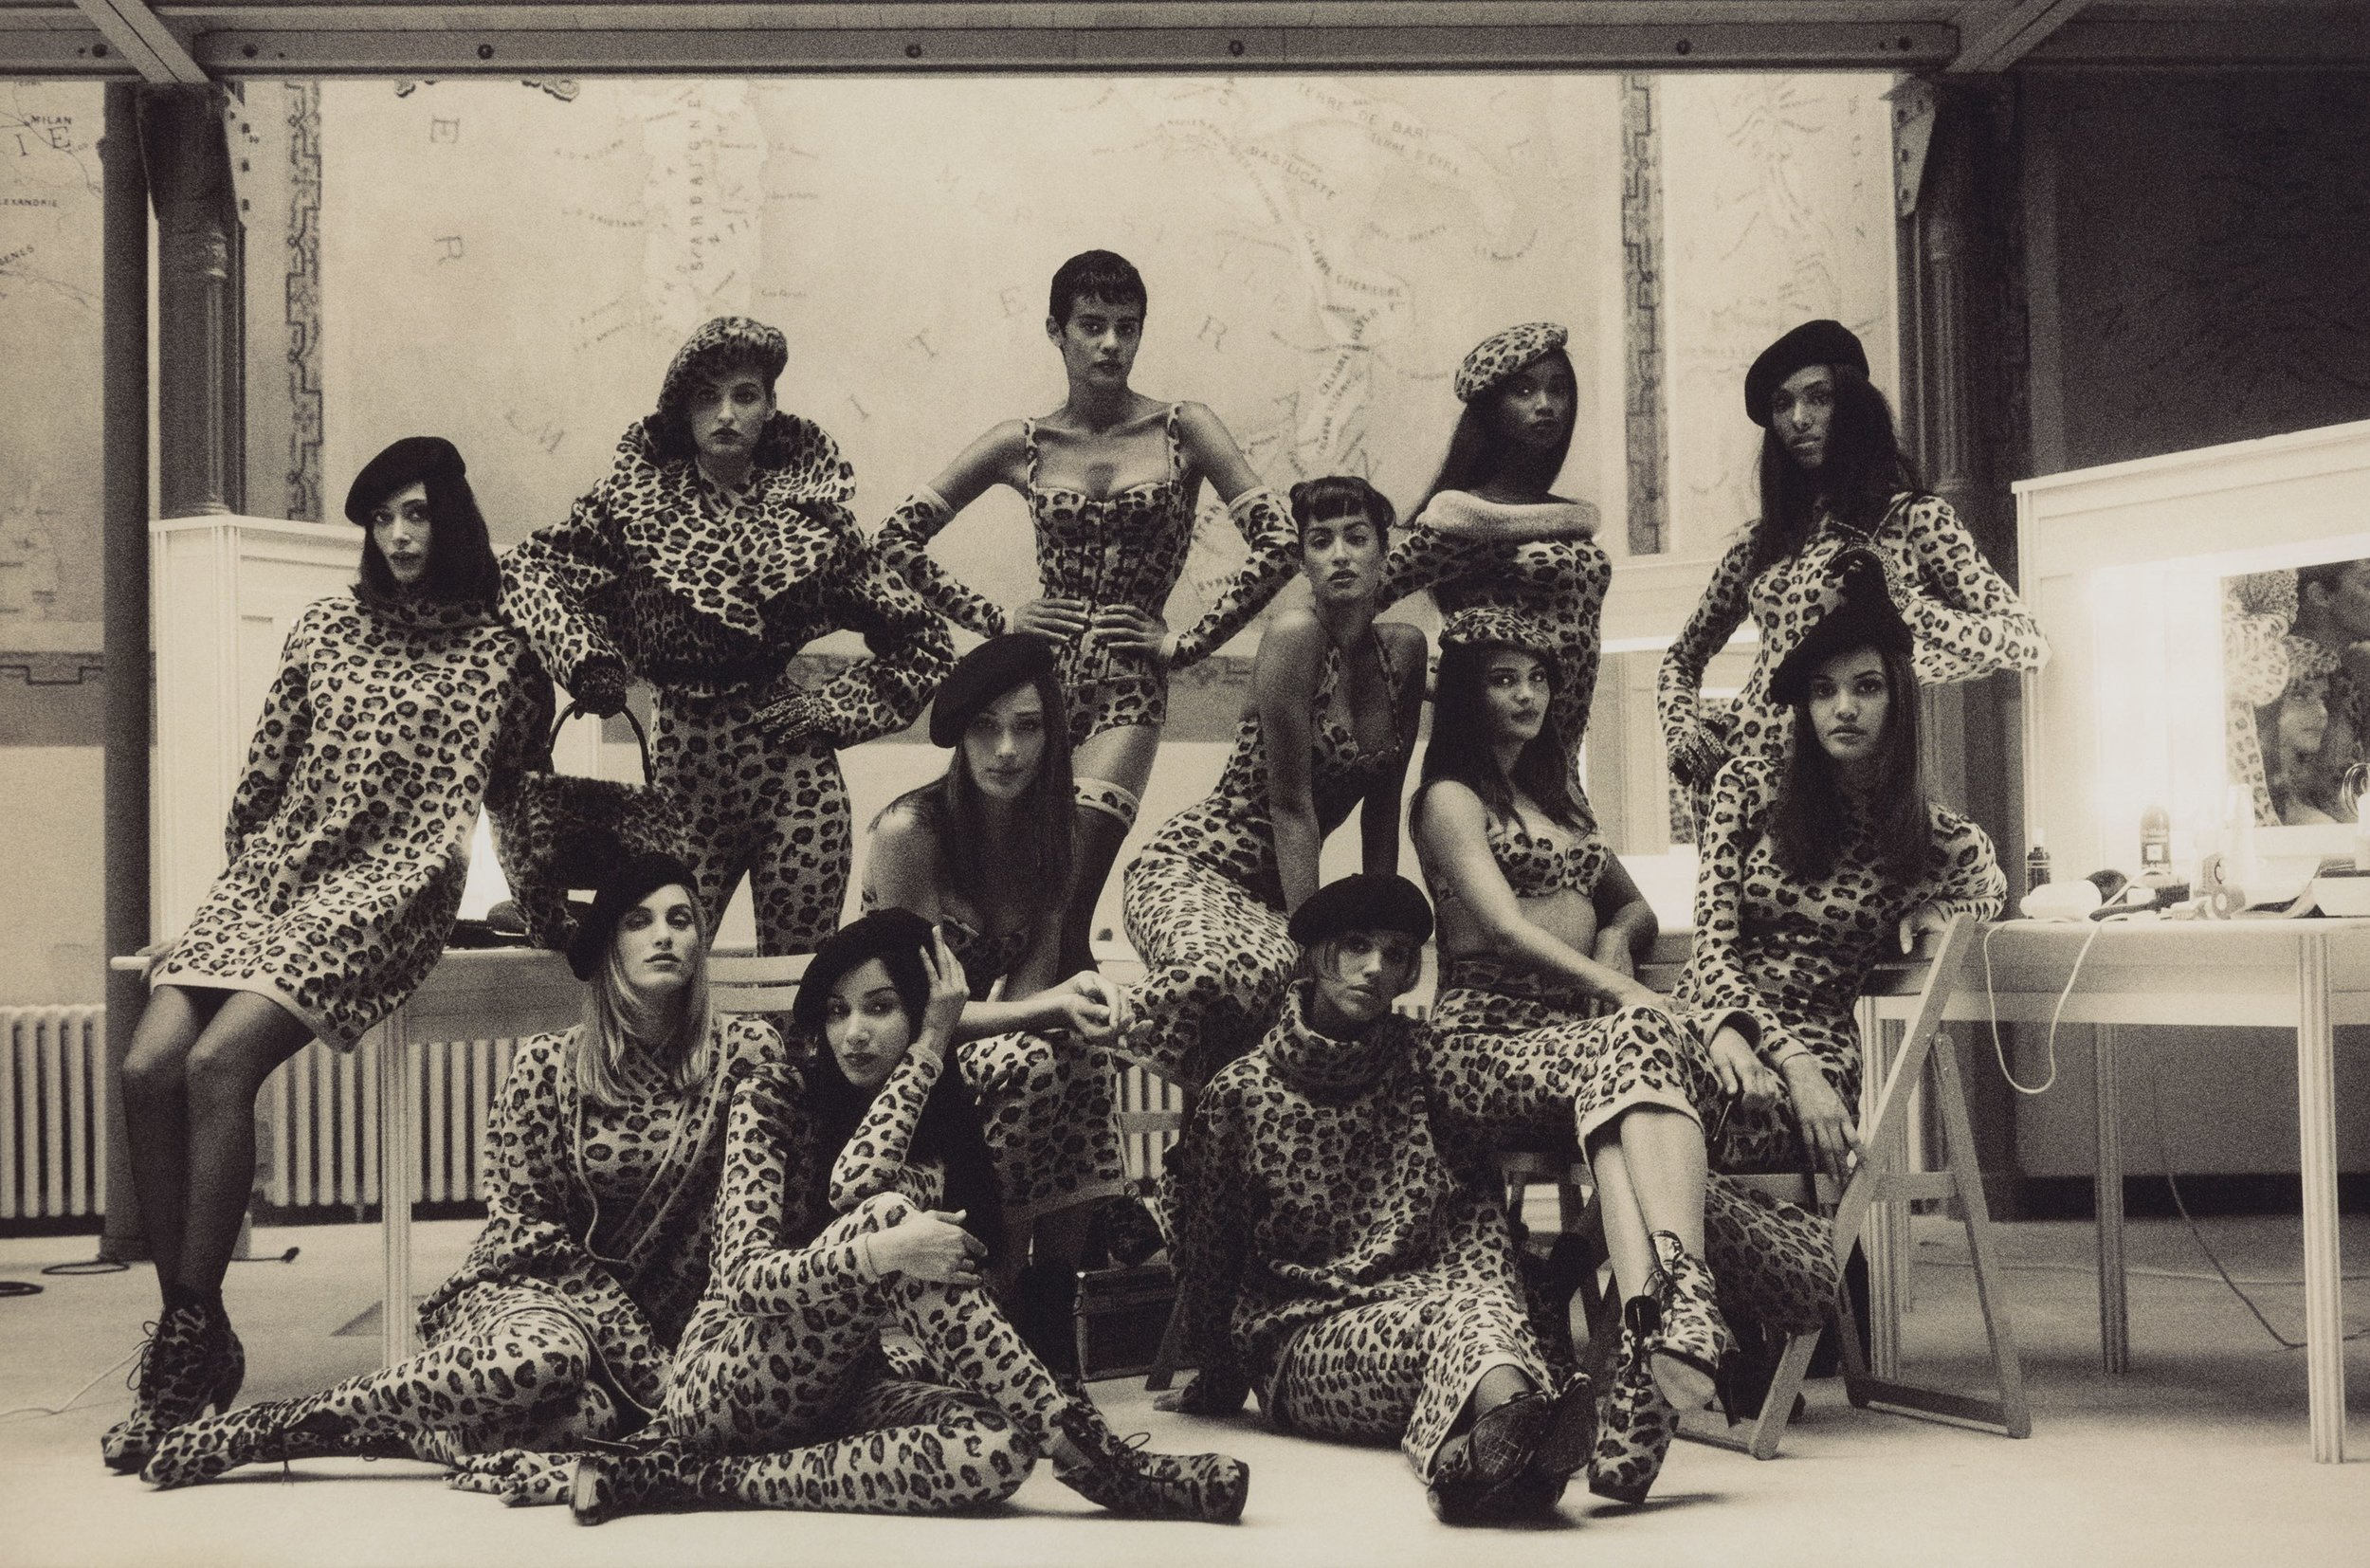 Photograph by Jean-Baptiste Mondino for Vogue,November 1991